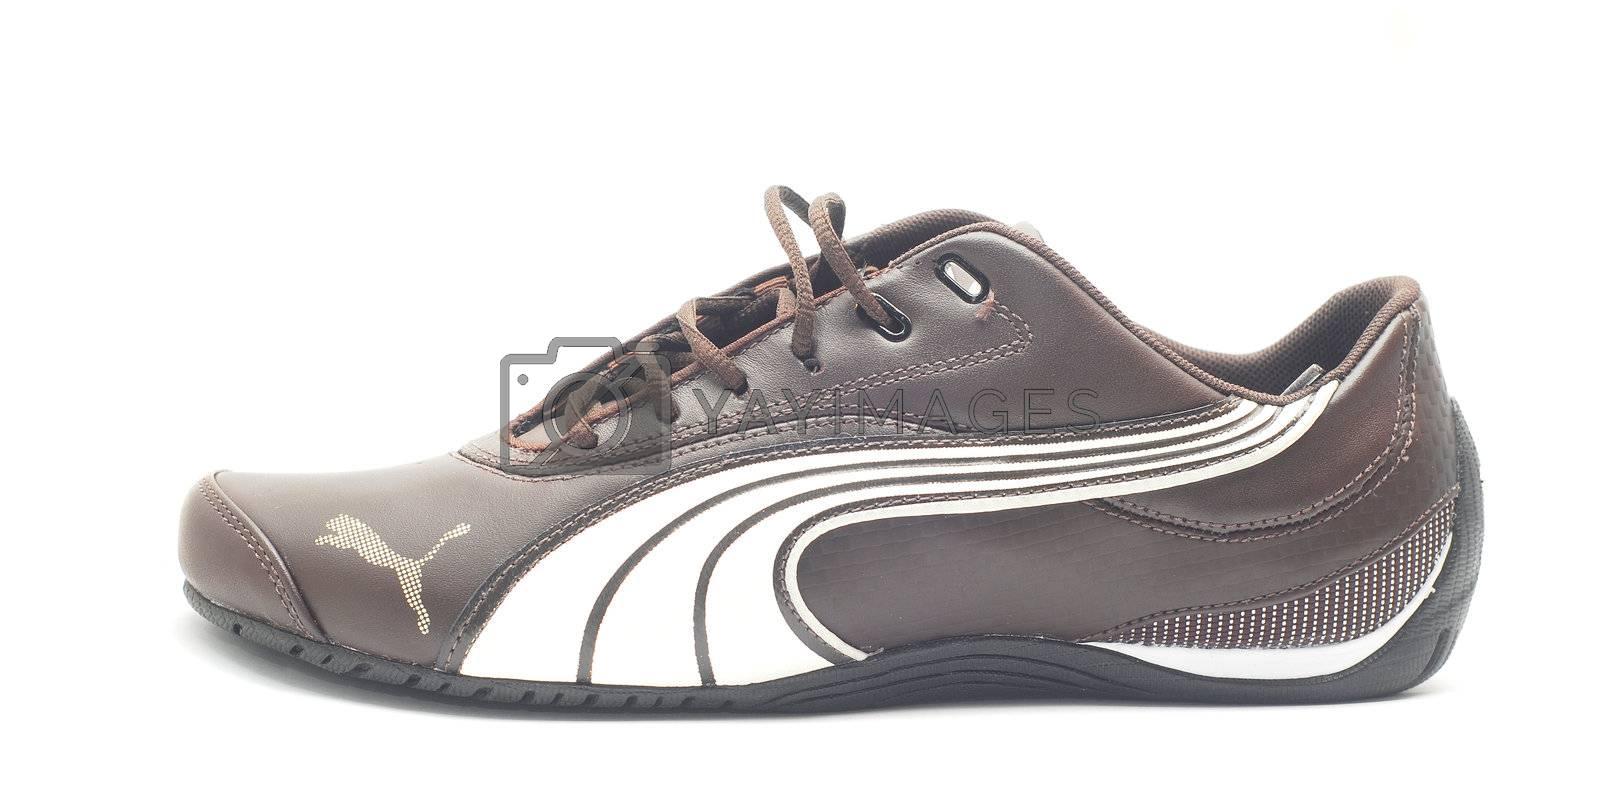 Caransebes, Romania - November 6, 2012 - Puma sport shoe isolated on white